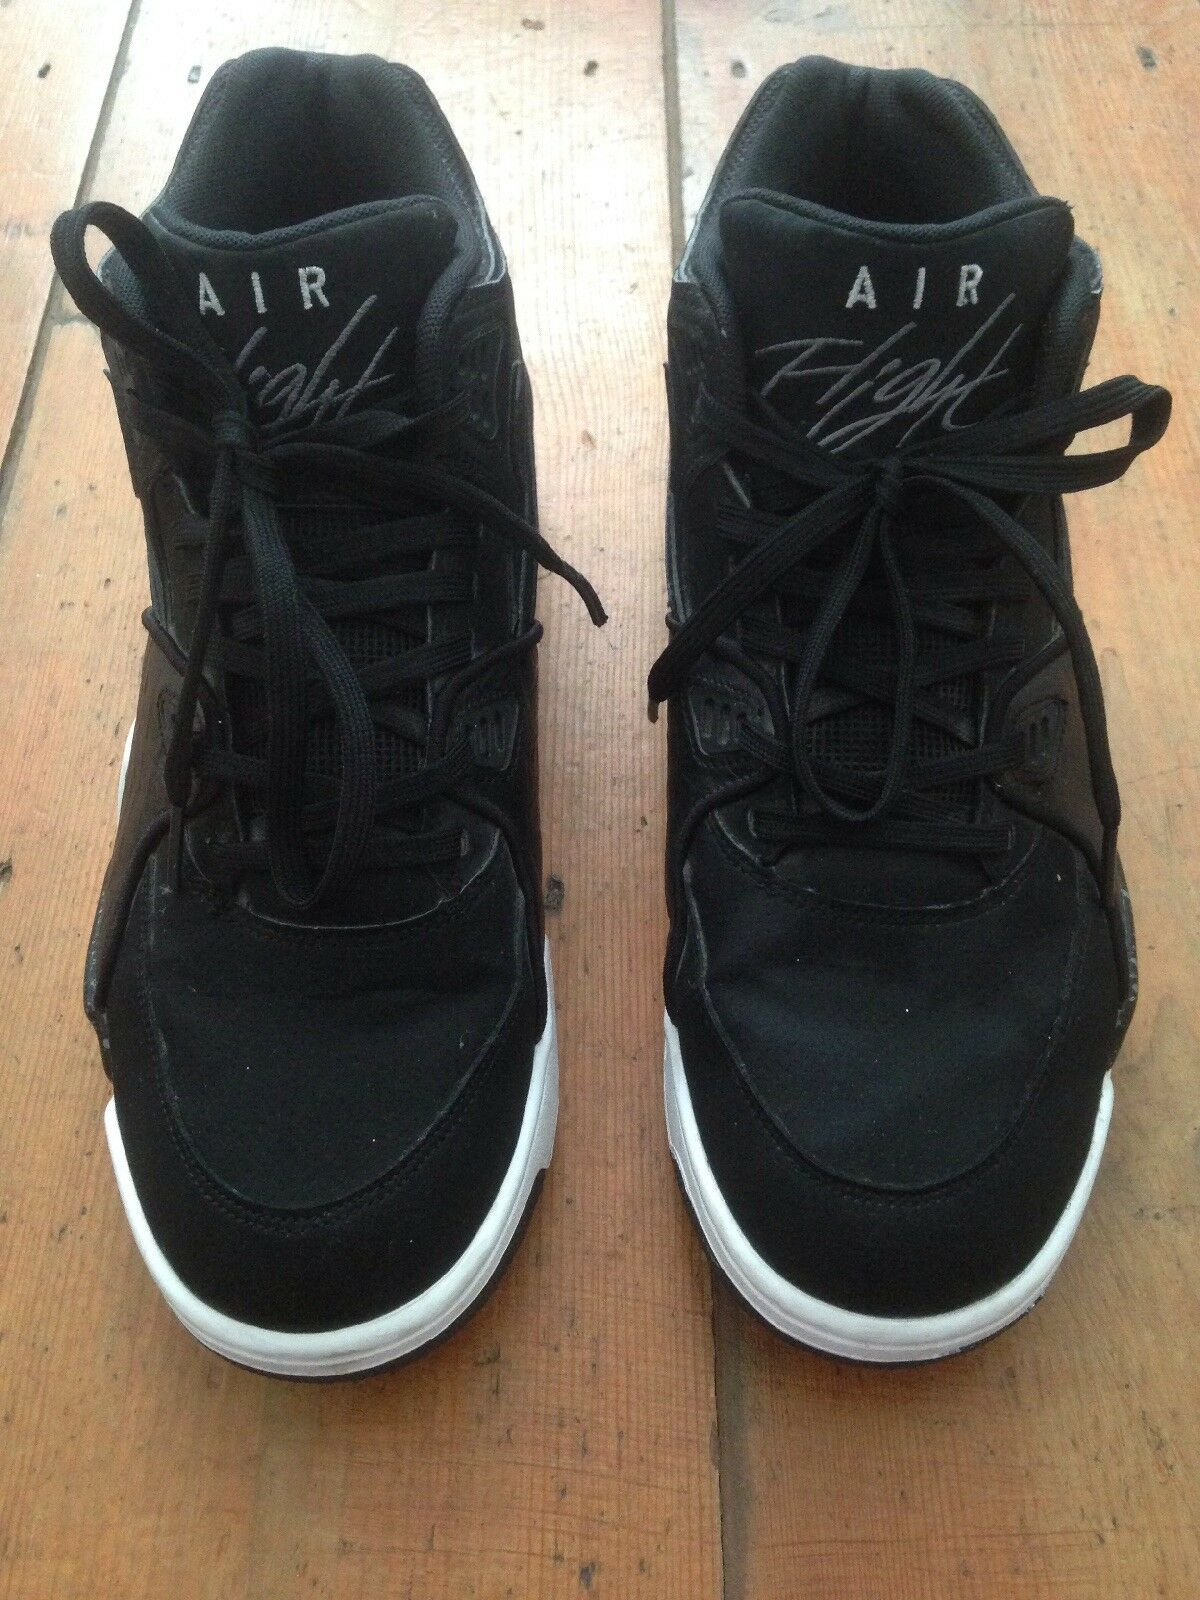 Men's  NIKE 89 AIR FLIGHT 89 NIKE  Athletic Shoes 663519